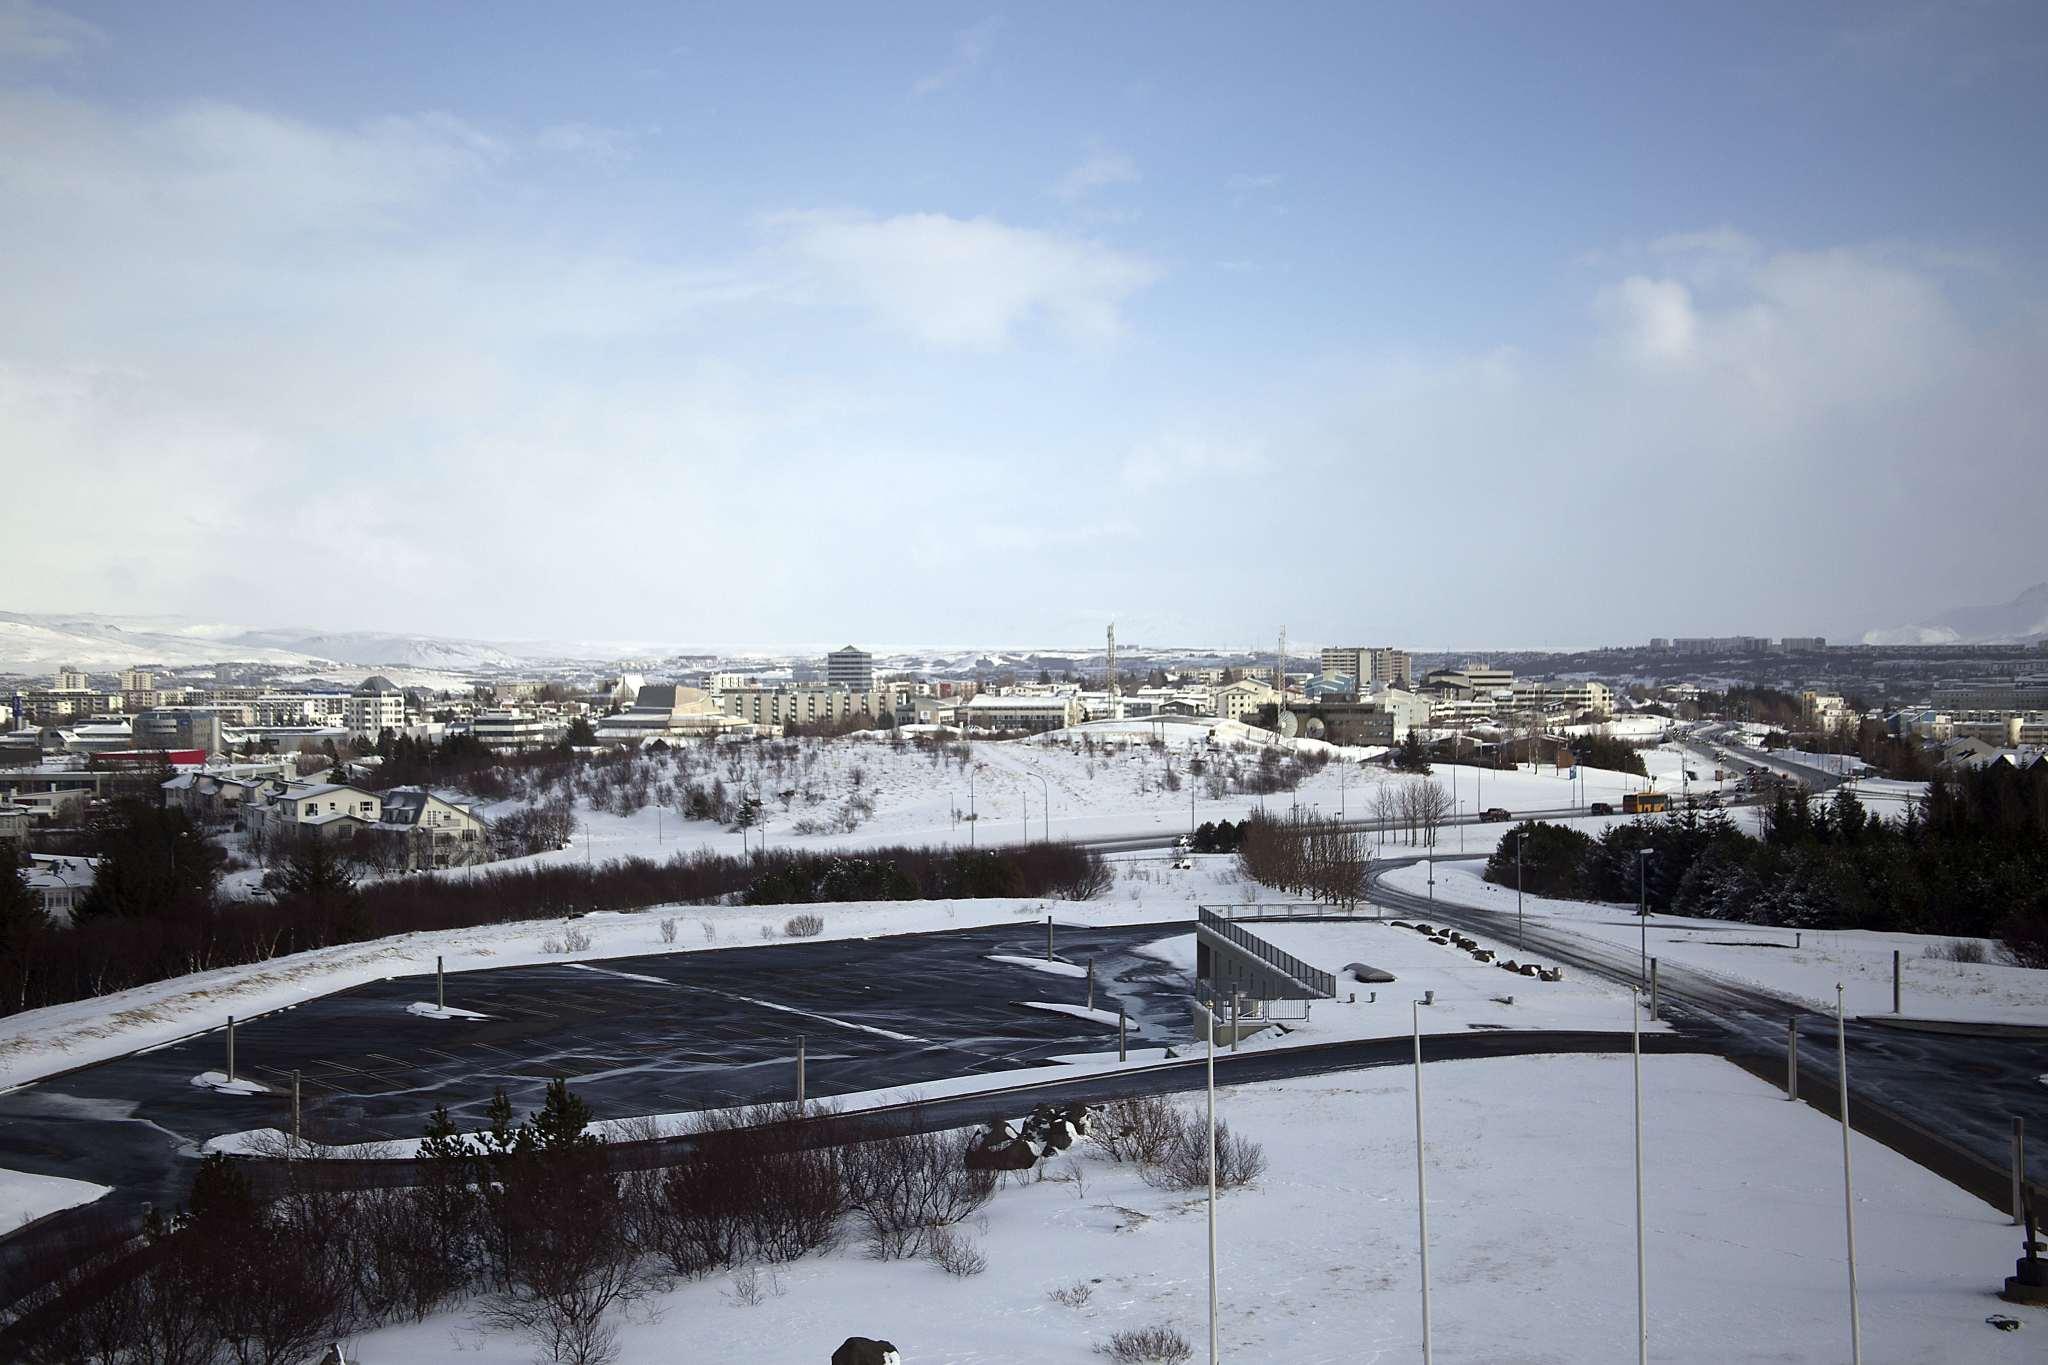 Looking out over Reykjavík